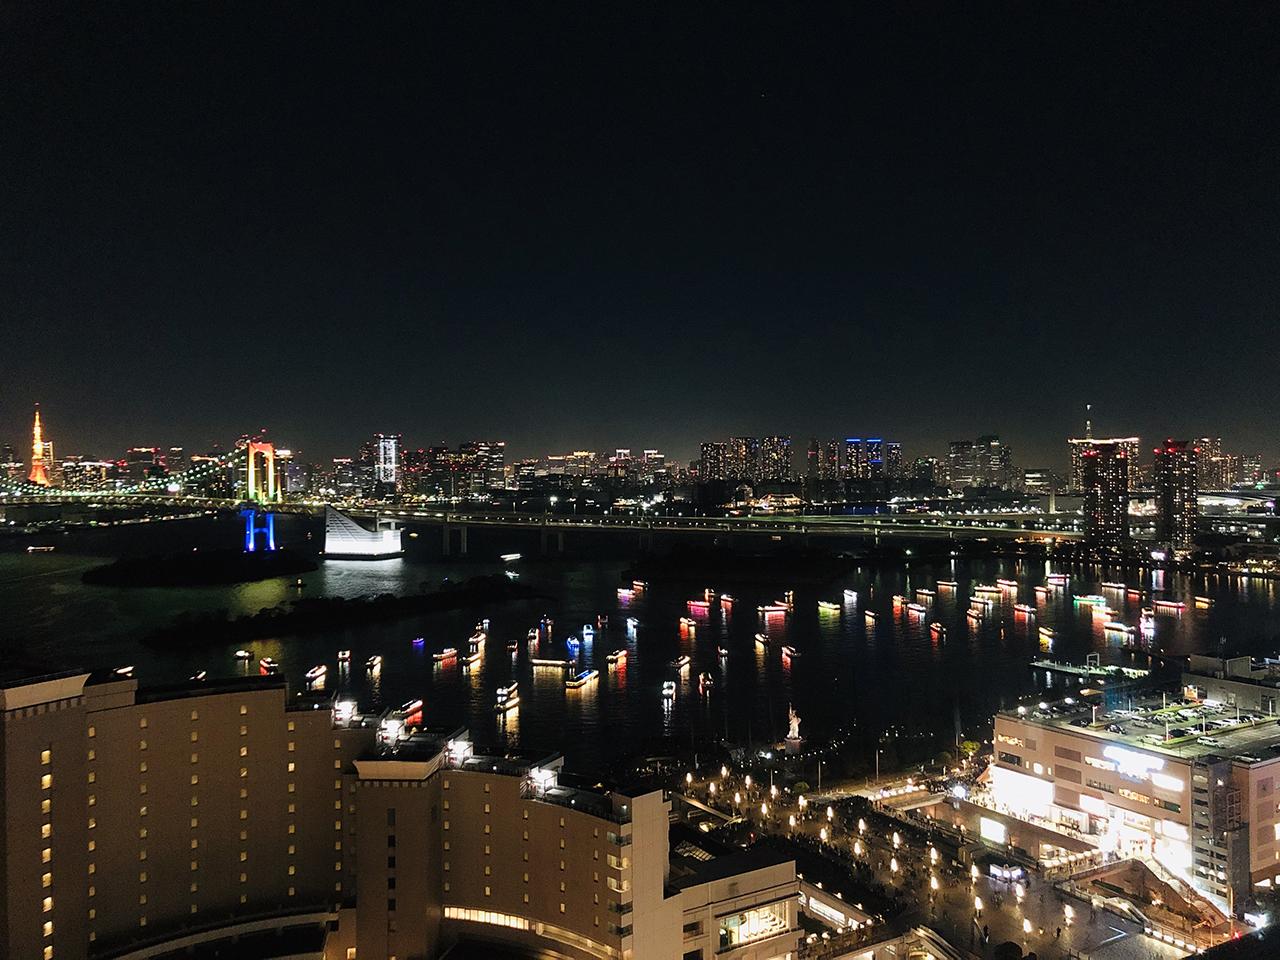 夜景の写真